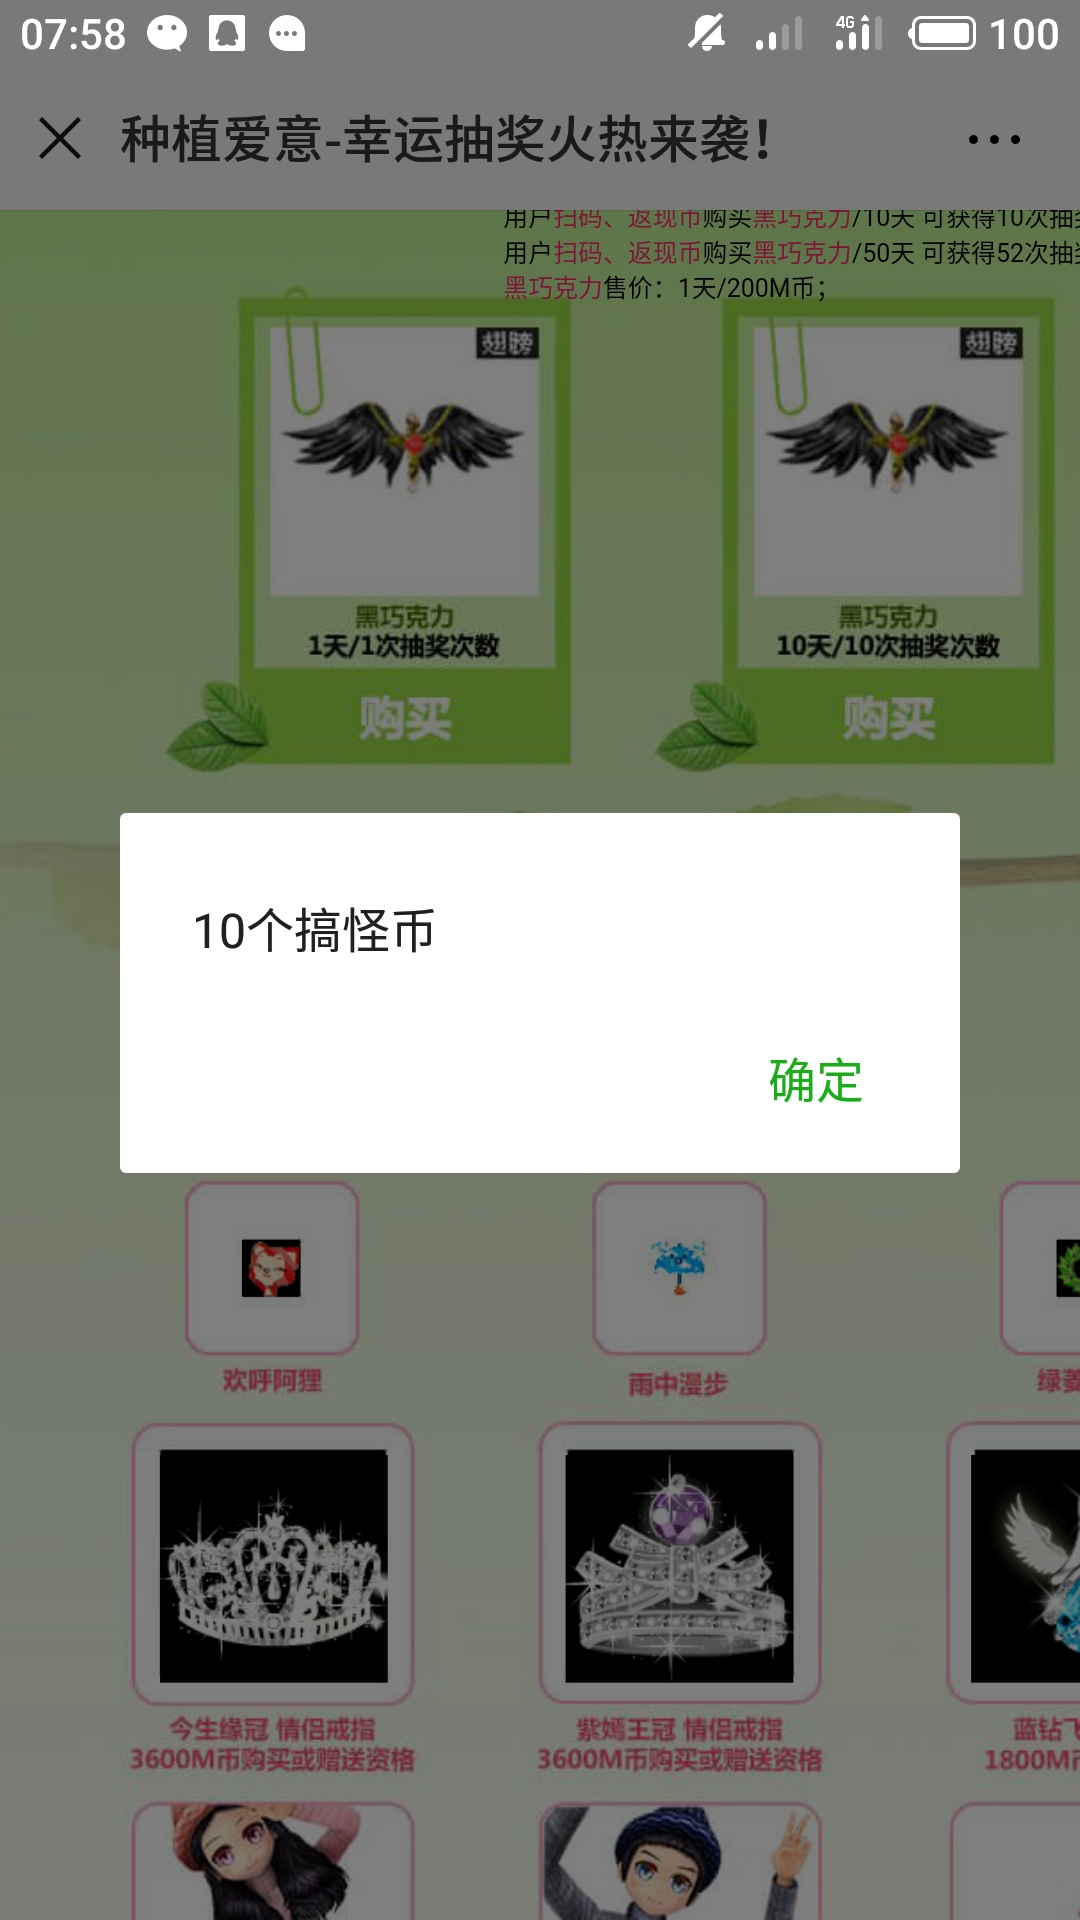 S80811-075851.jpg